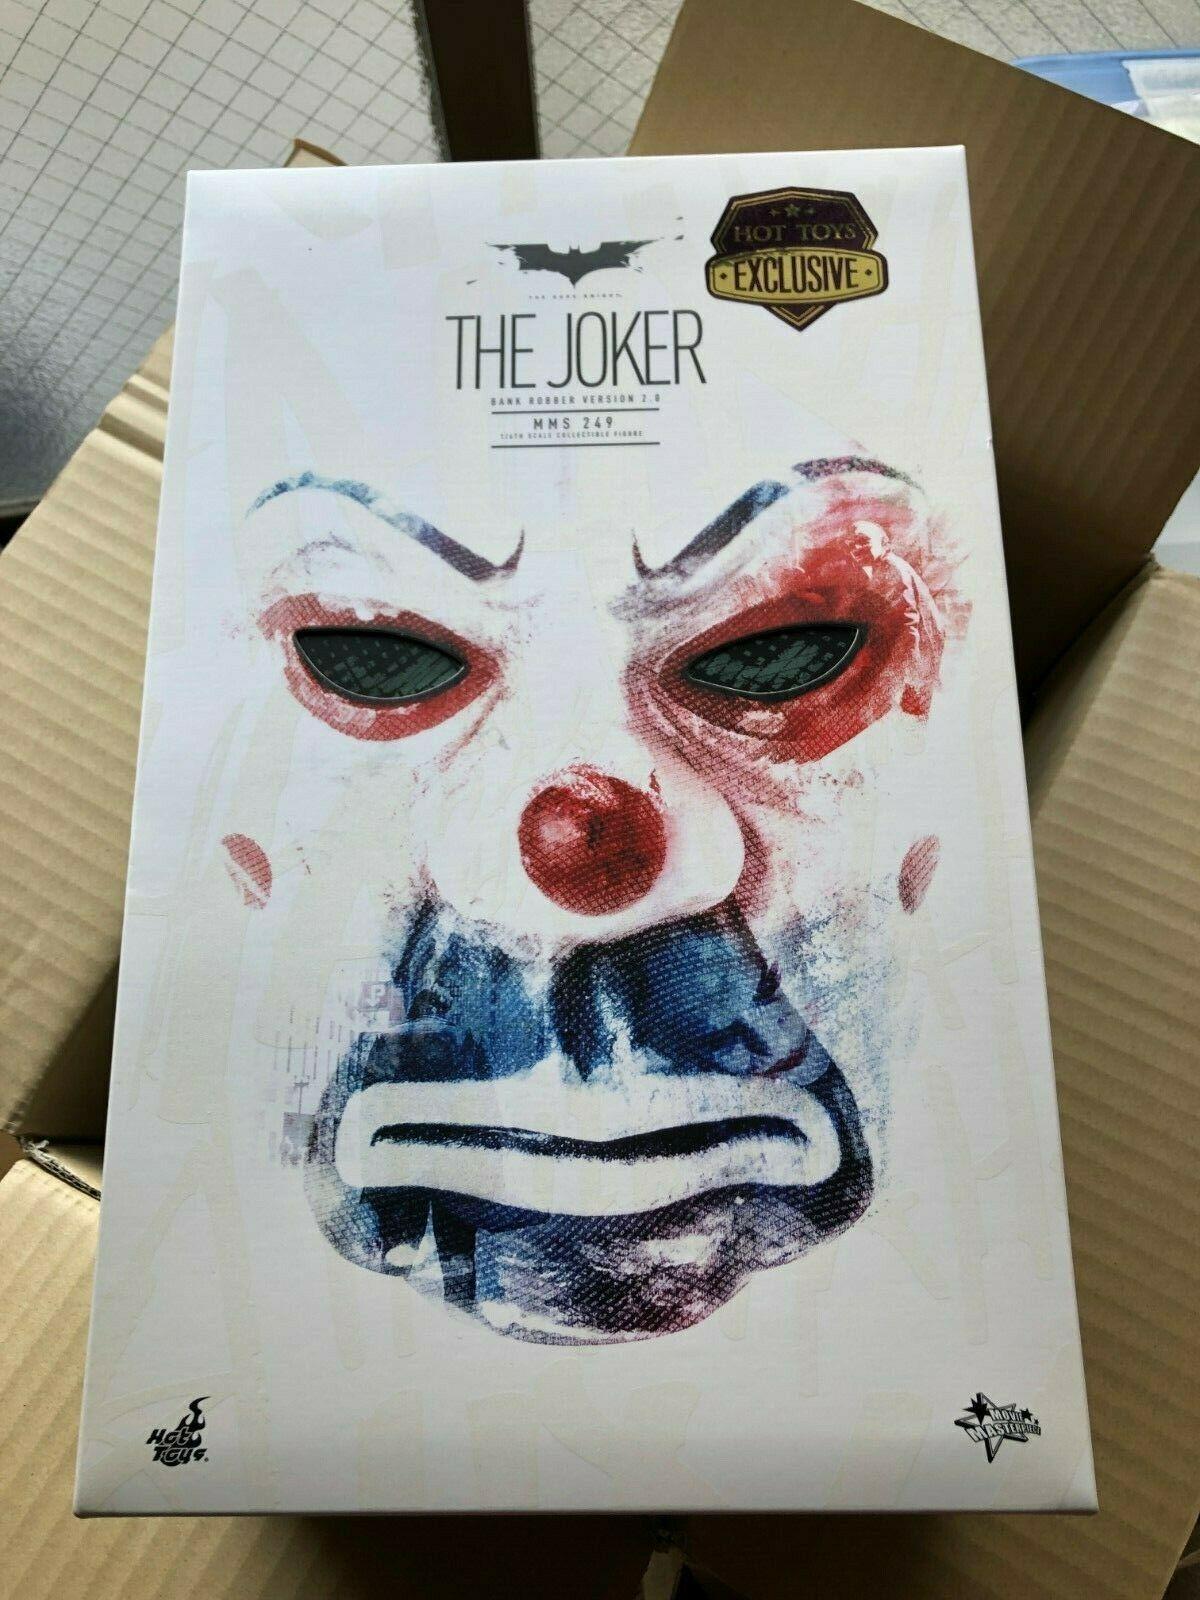 MMS249 caliente giocattoli 1 6 The Dark Knight TDK  The Joker Bank Robber 2.0  Mint   negozio online outlet